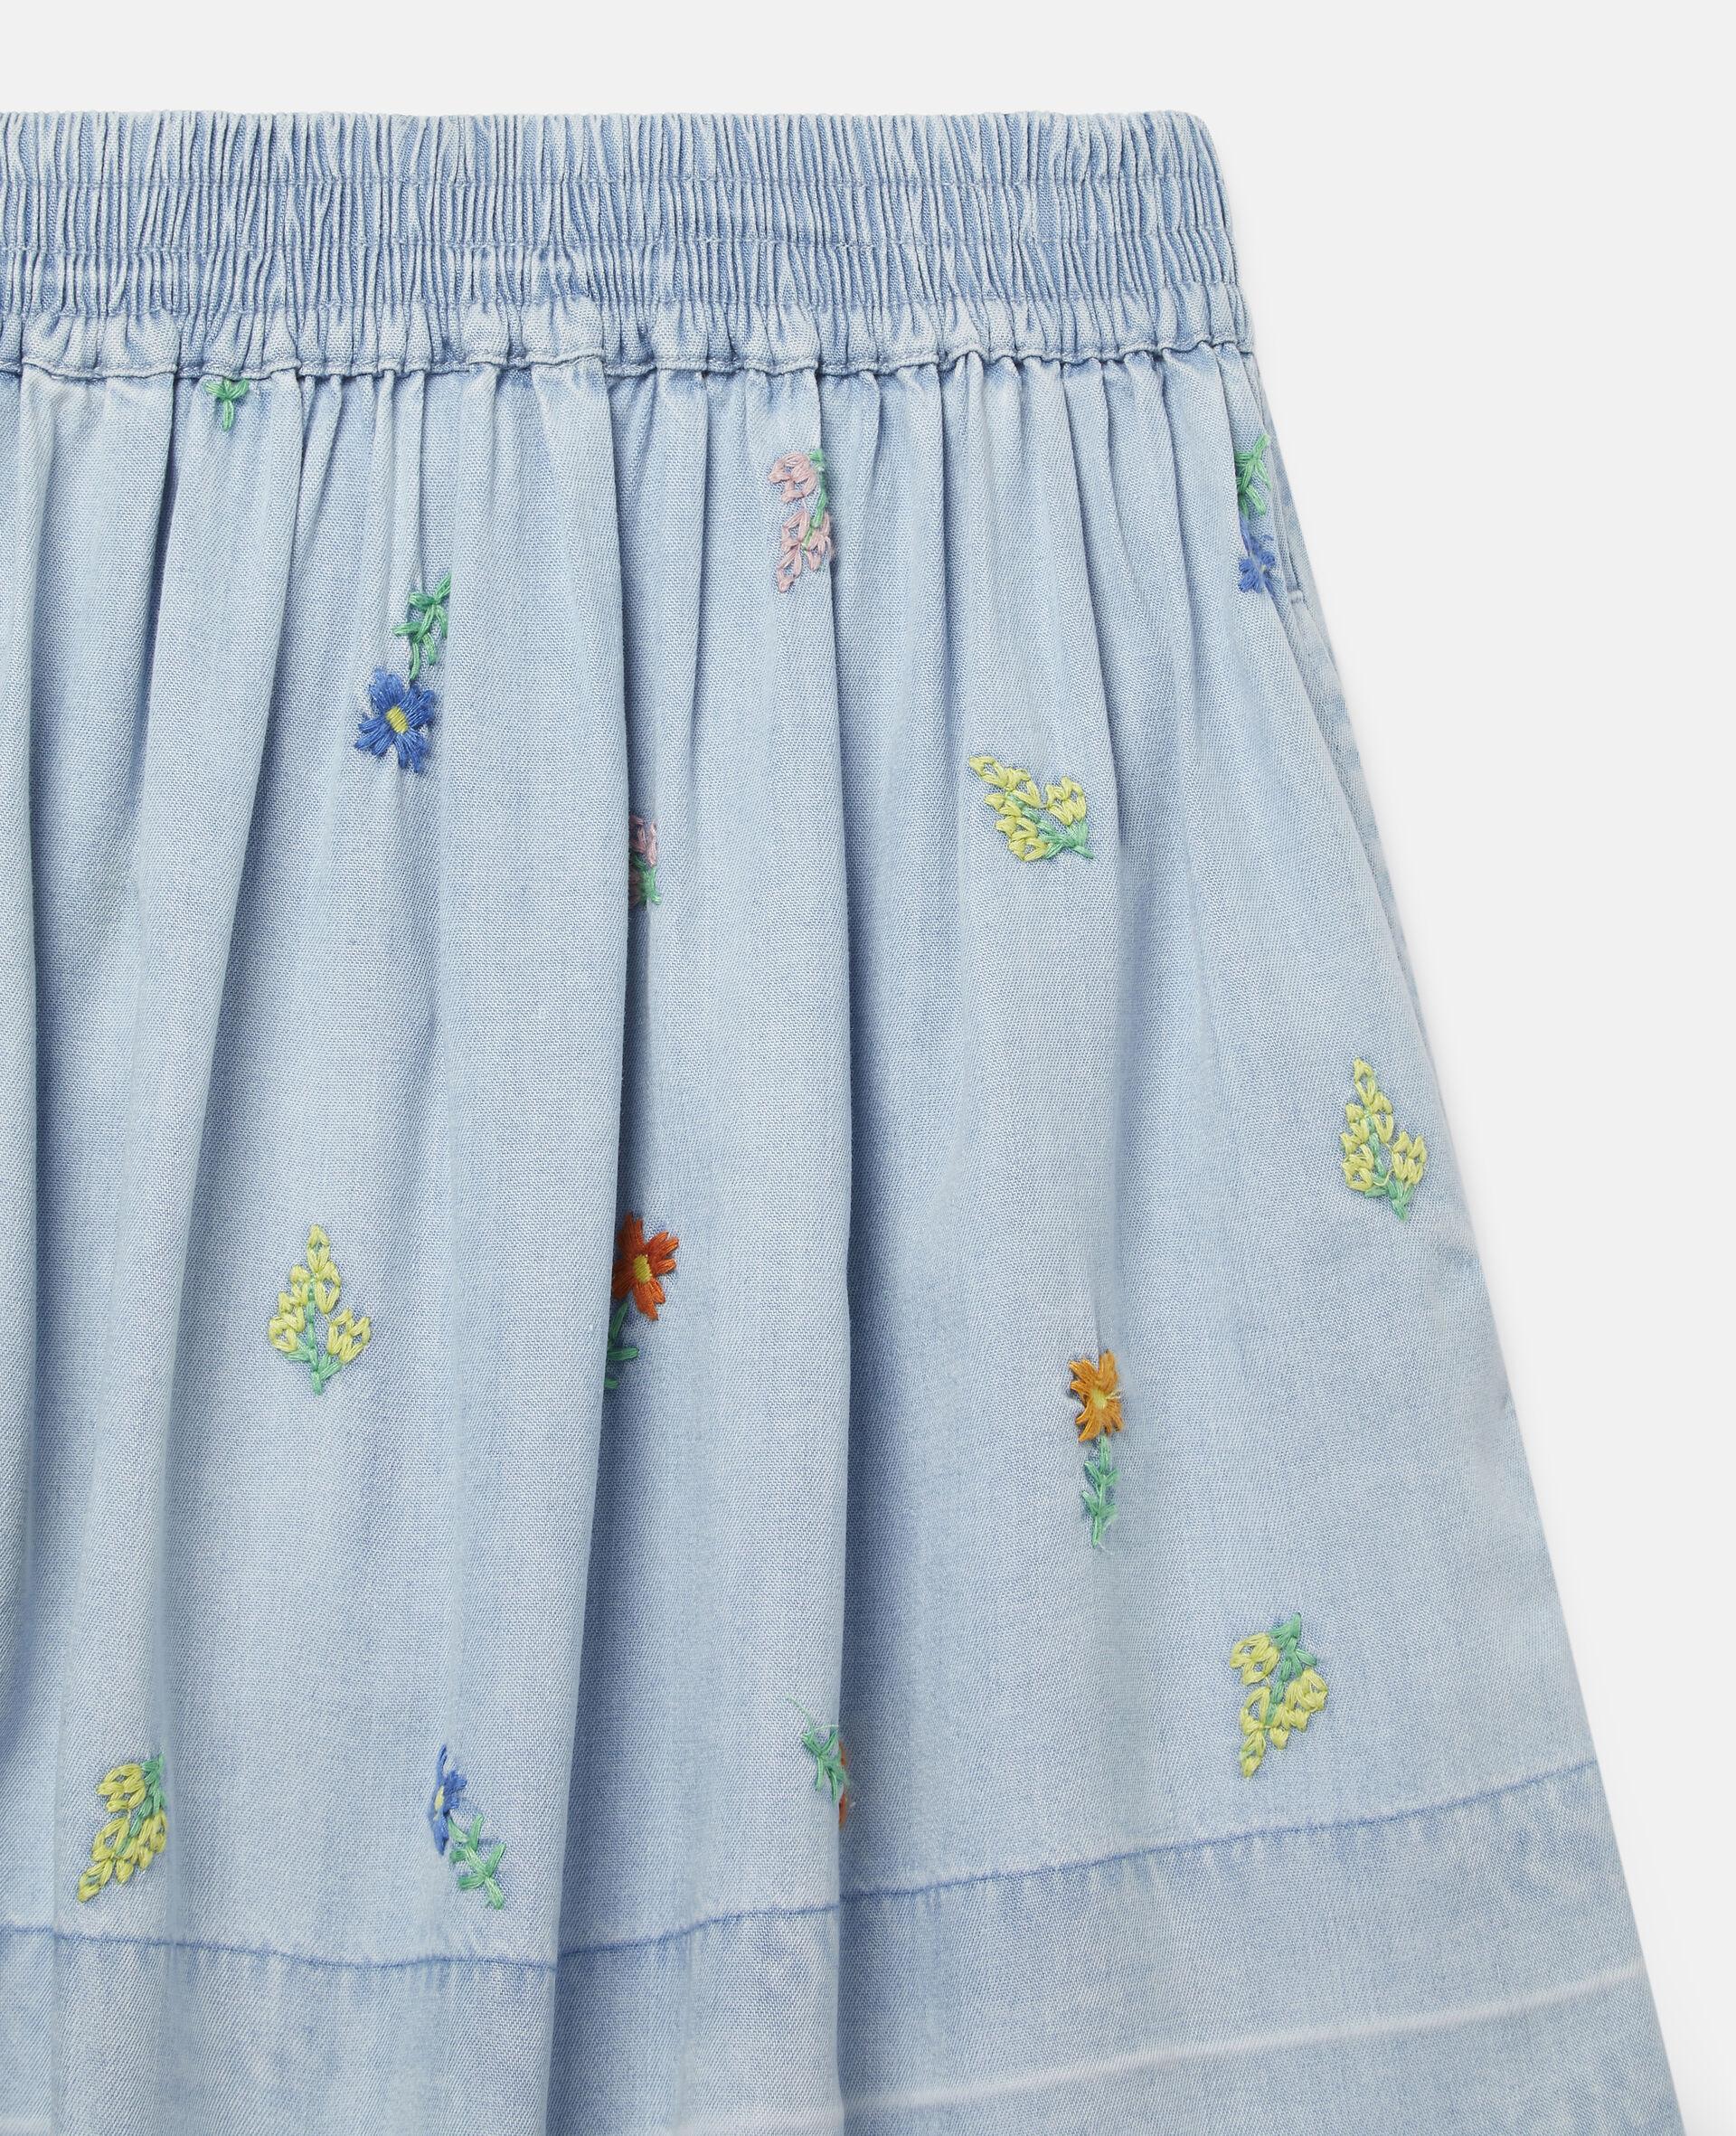 Embroidered Flowers Denim Skirt-Blue-large image number 1